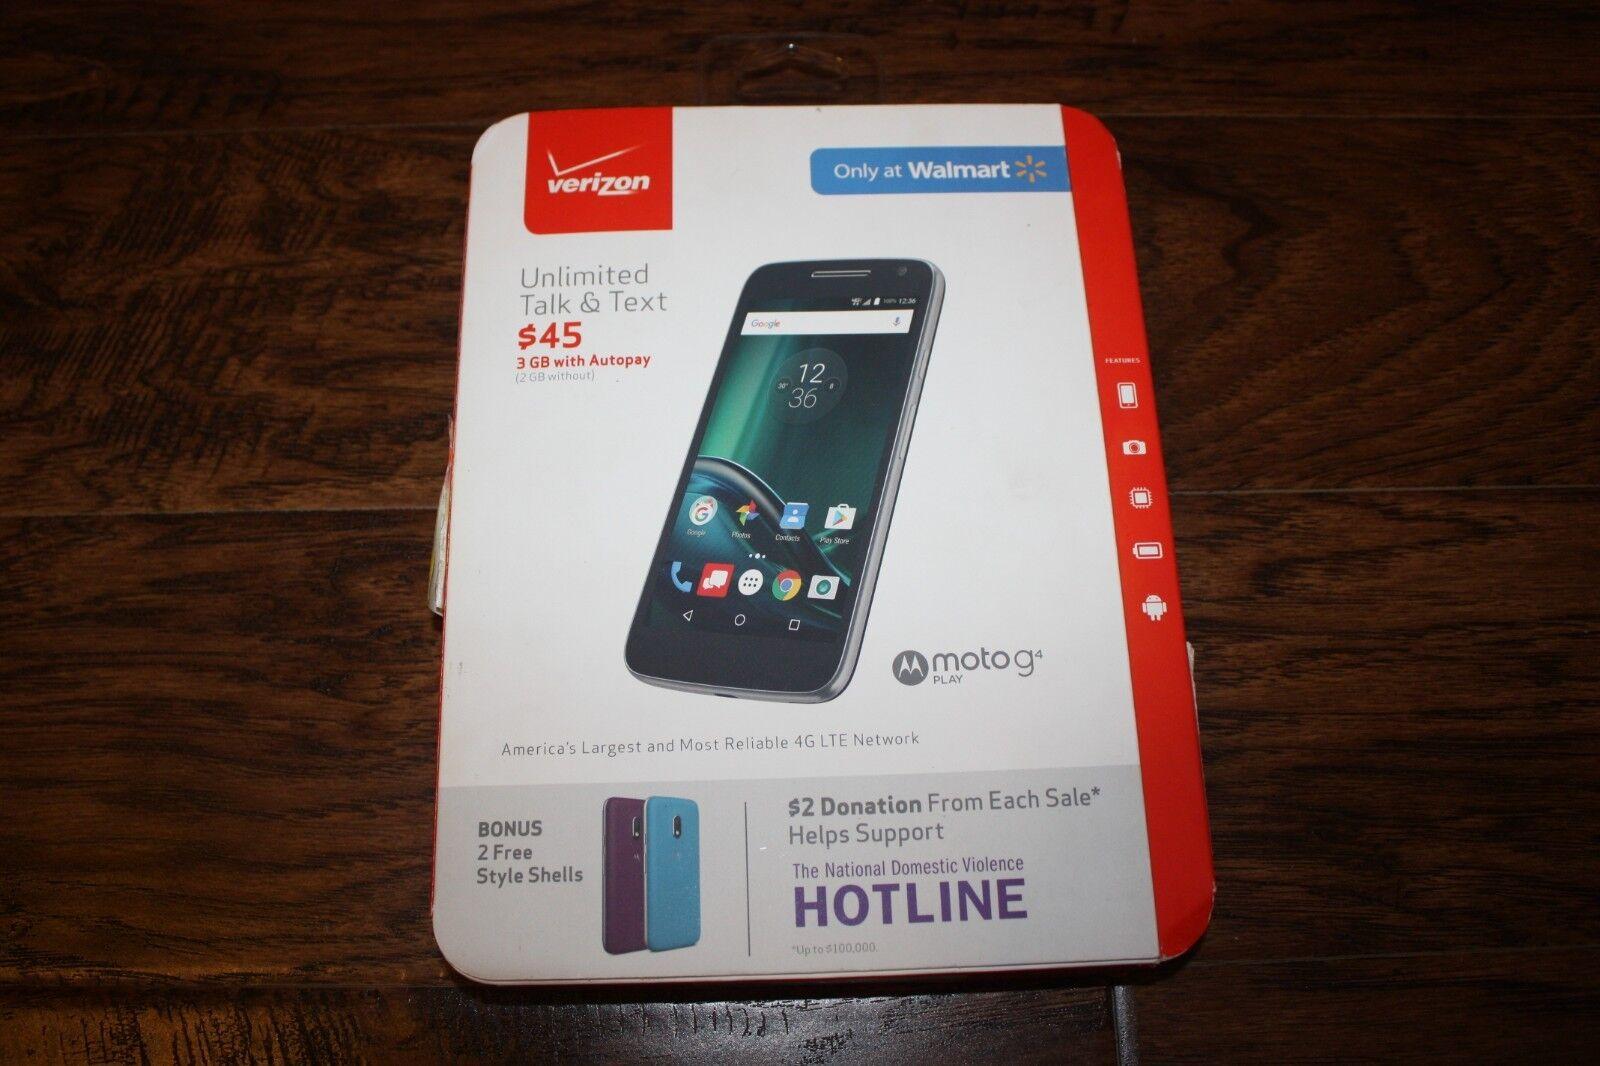 Verizon Prepaid Motorola Moto G G4 Play 4th Gen XT1609 4G